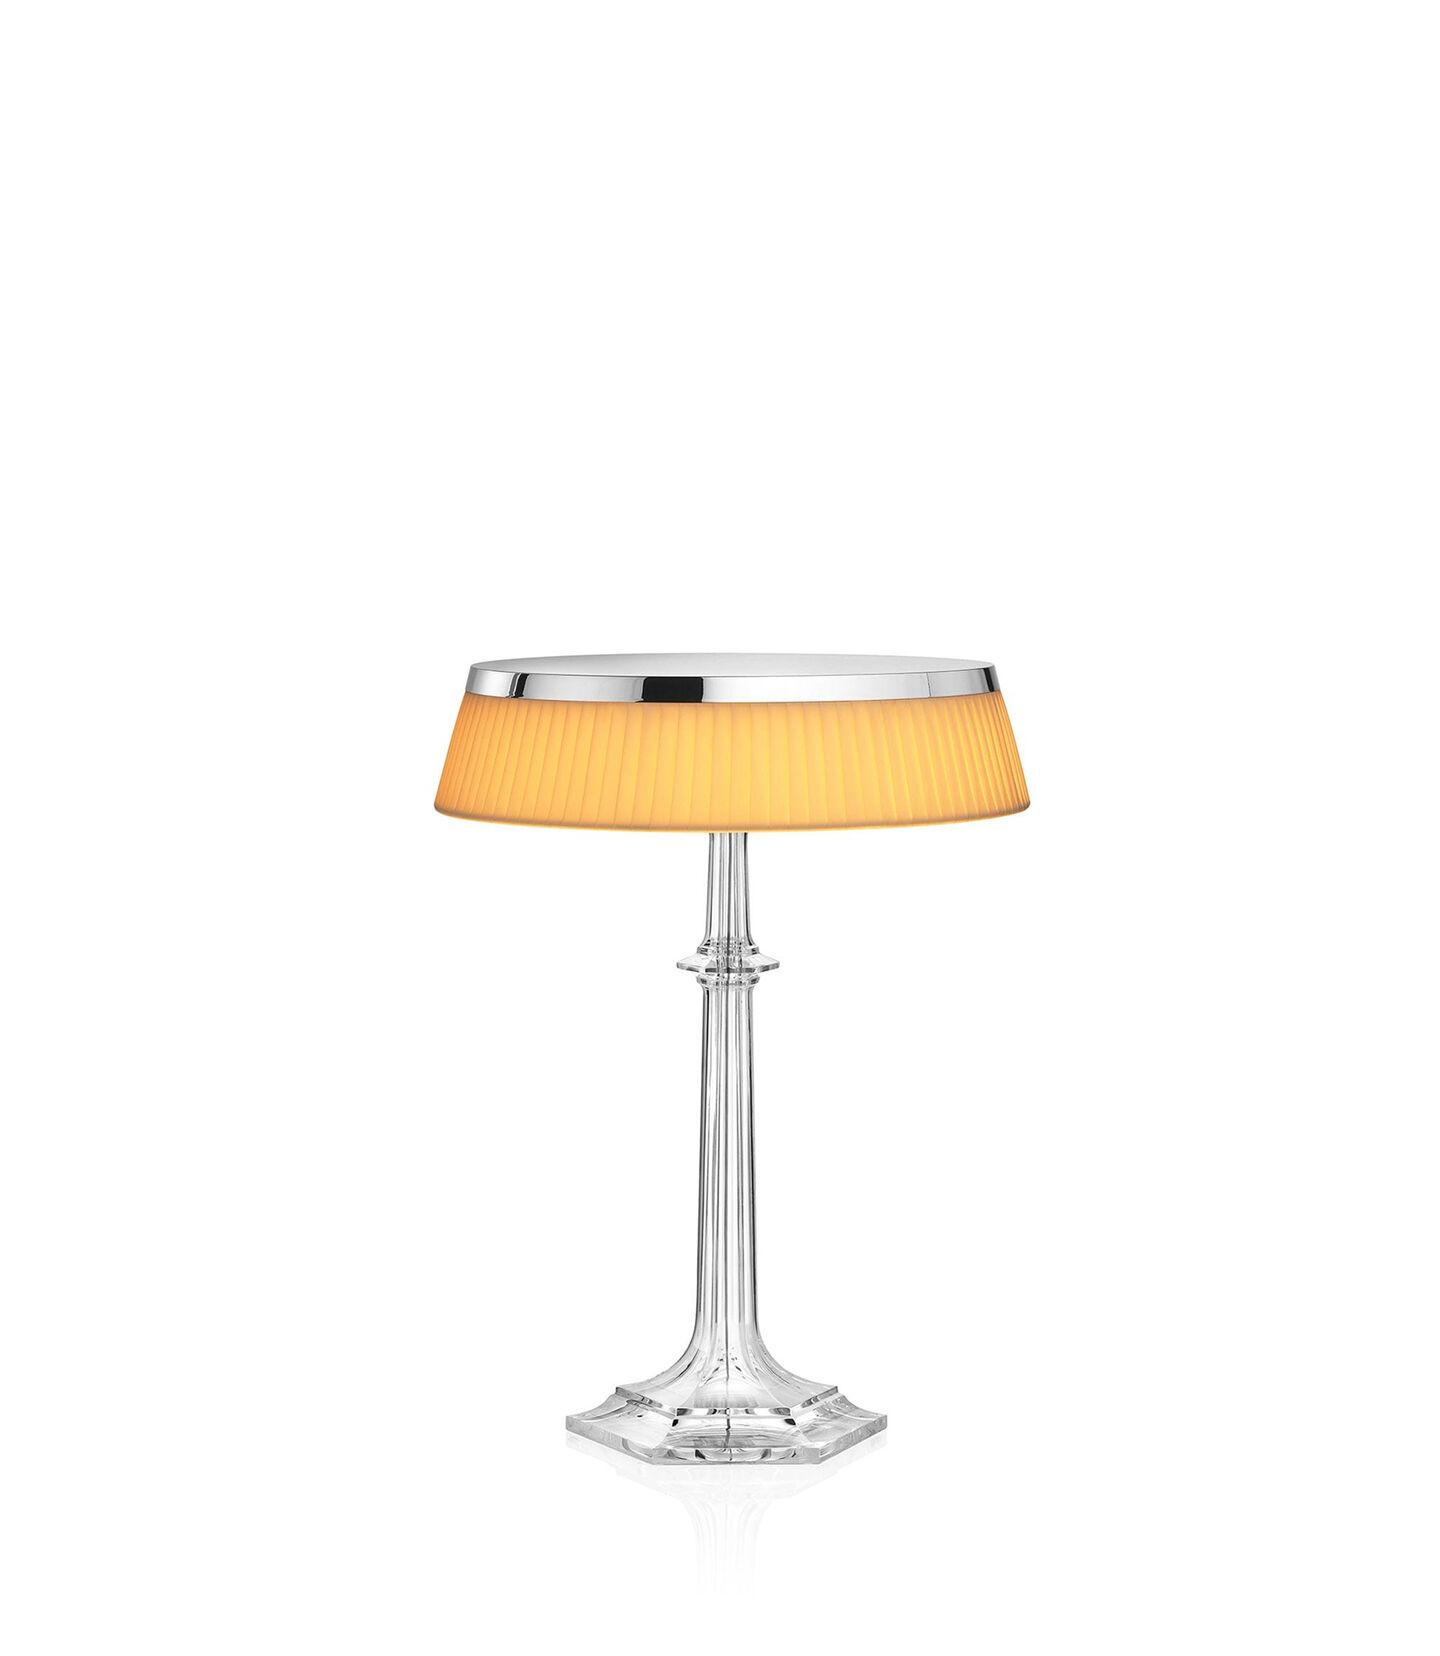 bon-jour-versailles-table-starck-flos-F1041057-product-still-life-big-1